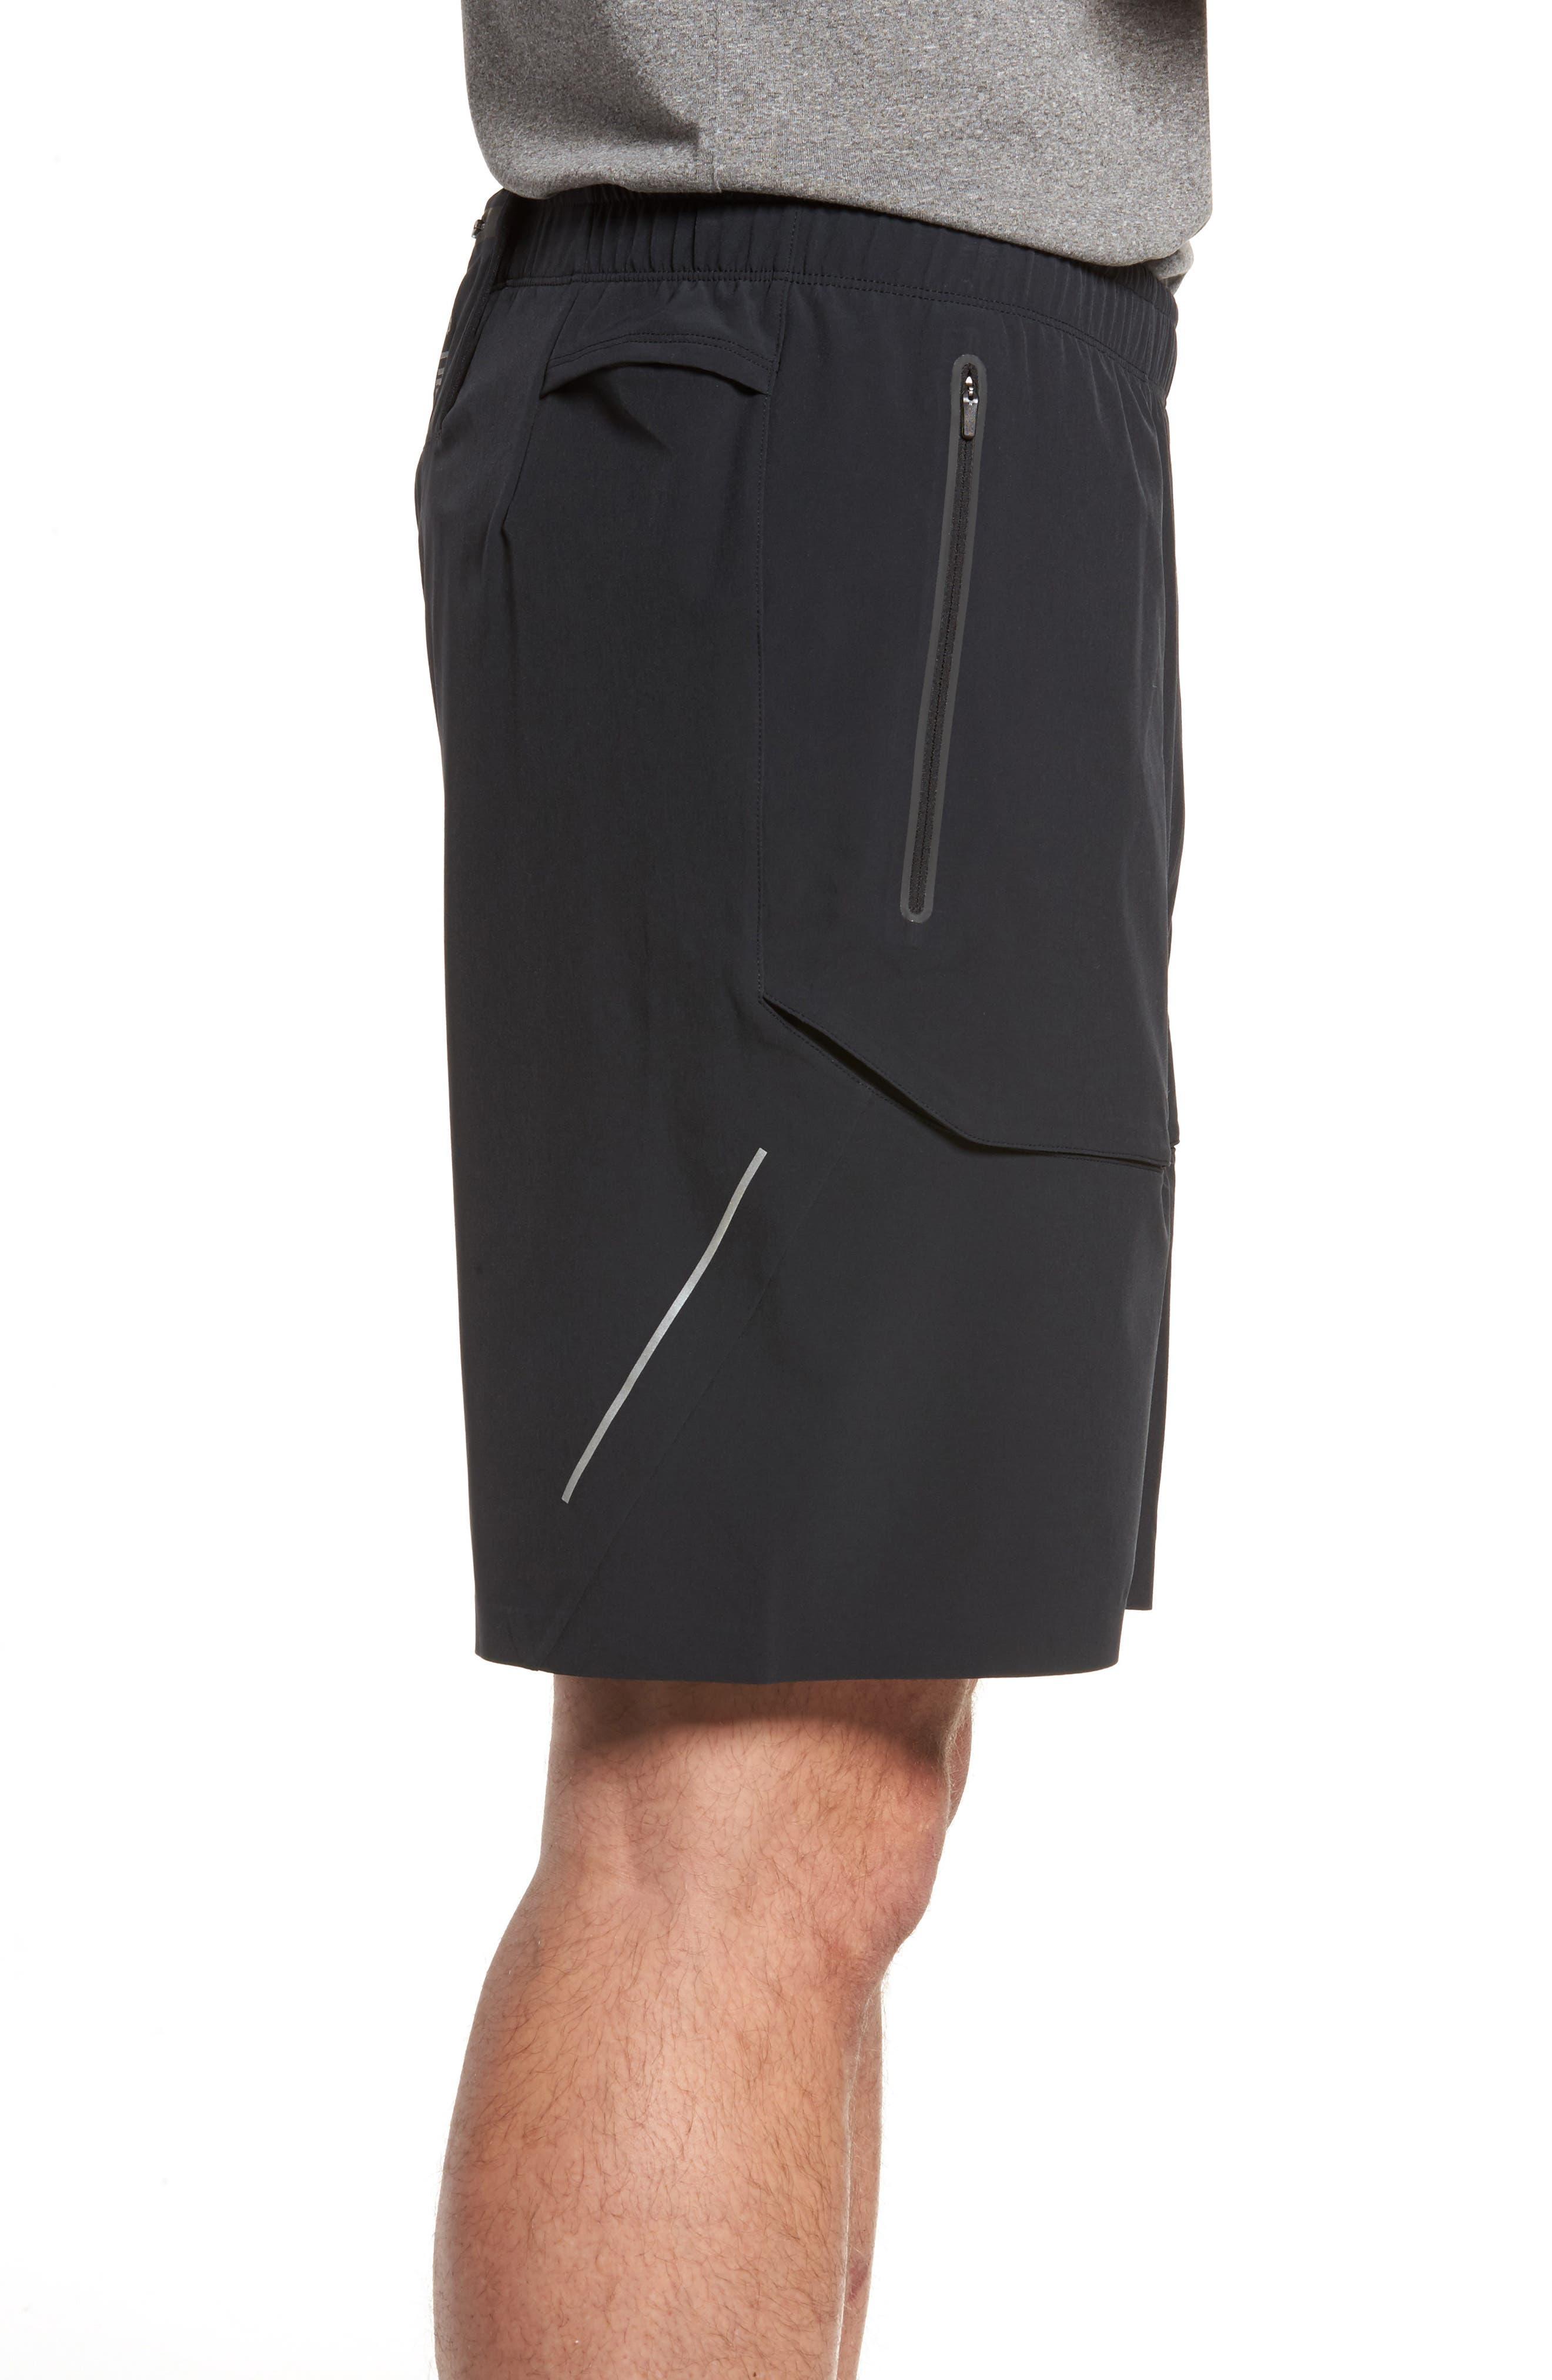 Running Shield Shorts,                             Alternate thumbnail 3, color,                             Black